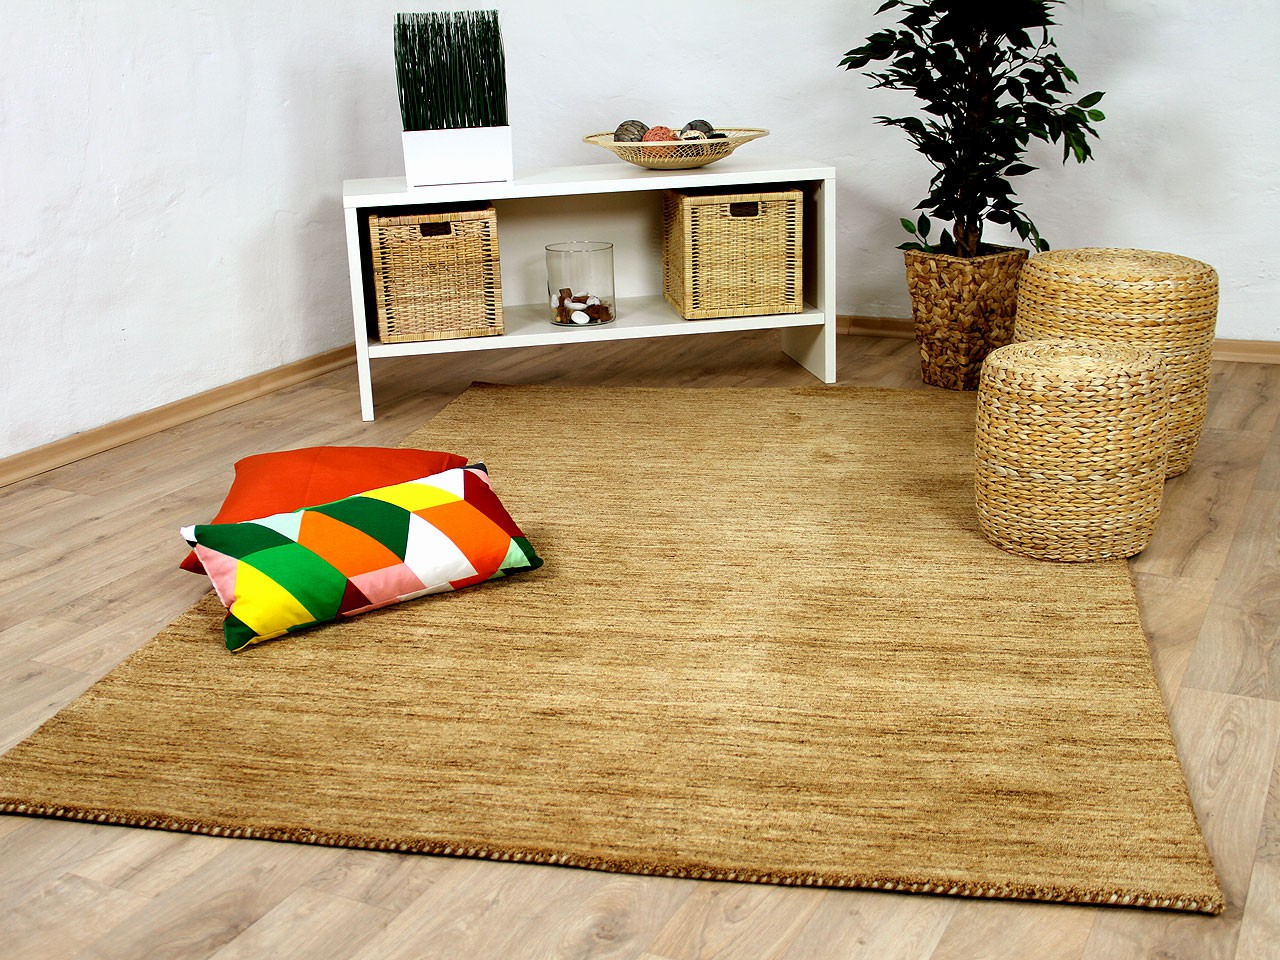 natur teppich indo gabbeh ella beige teppiche nepal gabbeh und kelim teppiche indo gabbeh teppiche. Black Bedroom Furniture Sets. Home Design Ideas